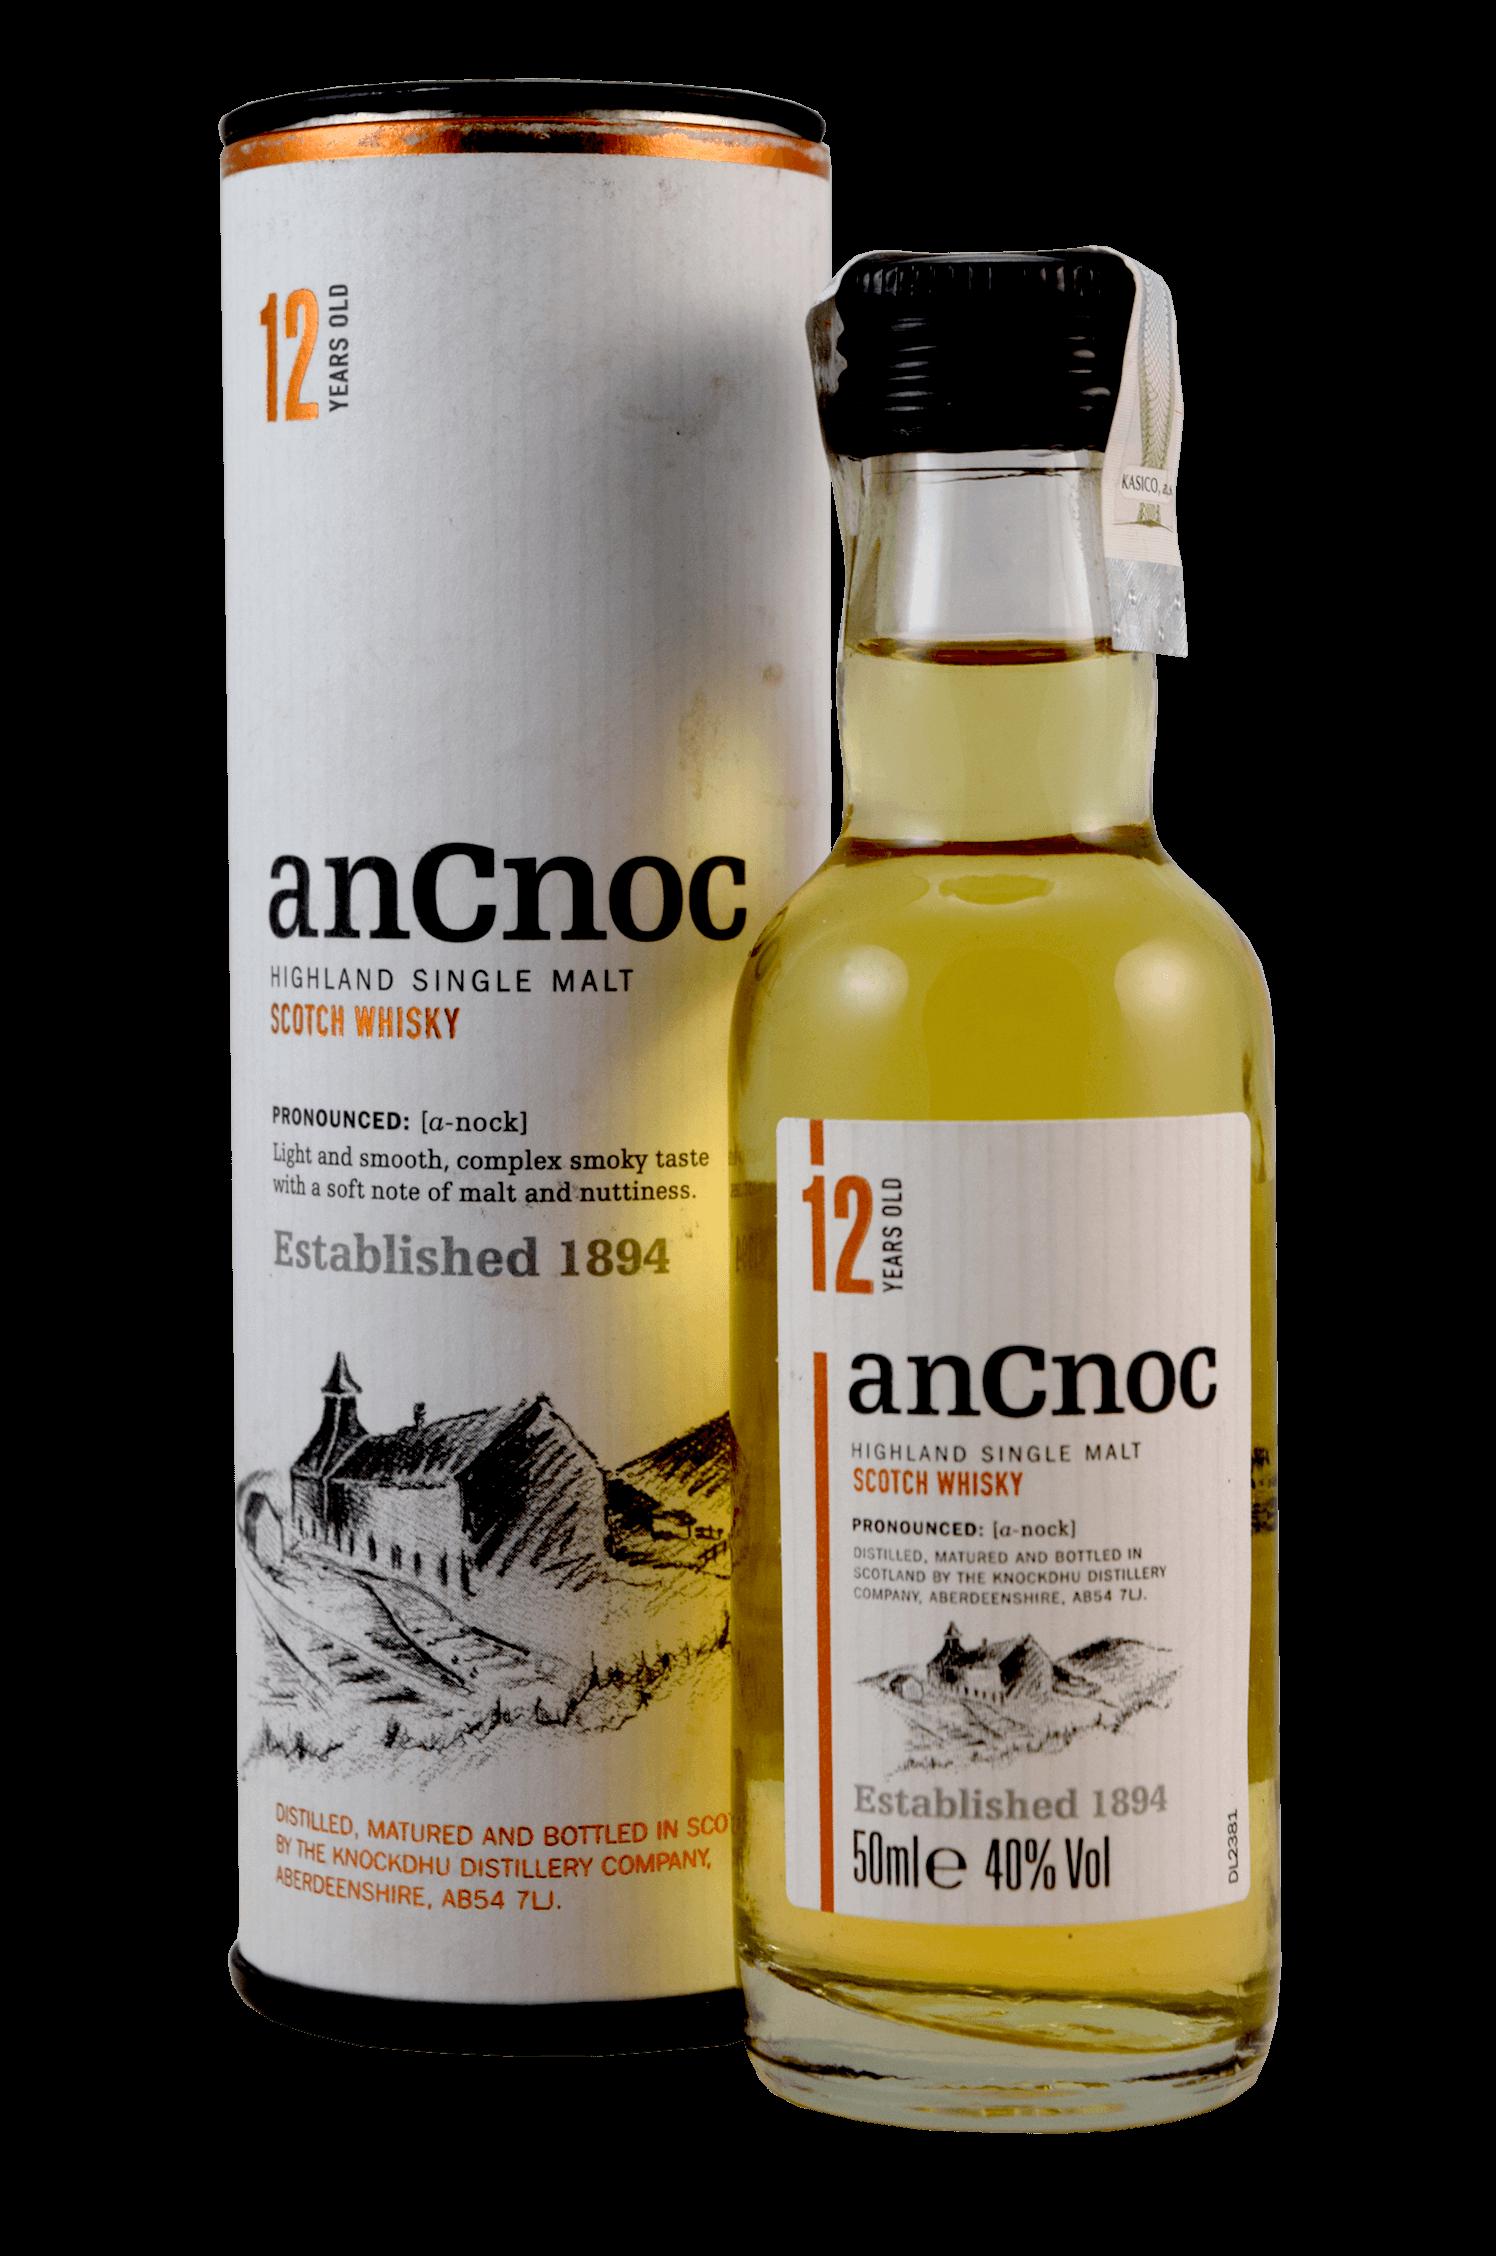 Ancnoc Scotch Whisky